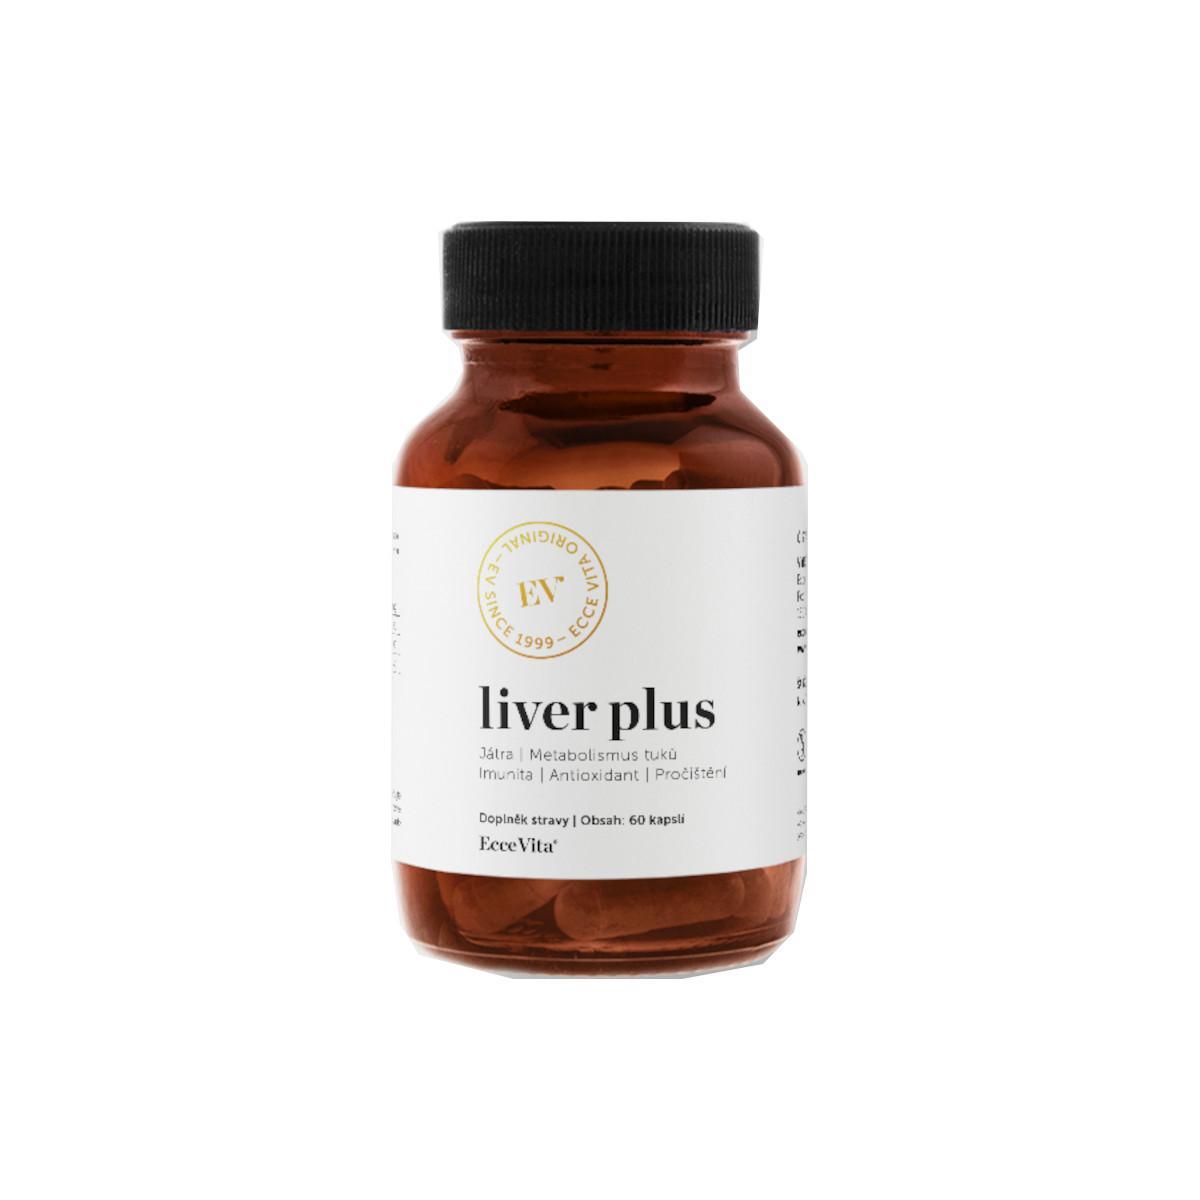 Ecce Vita Liver Plus, kapsle 60 ks, 21,6 g